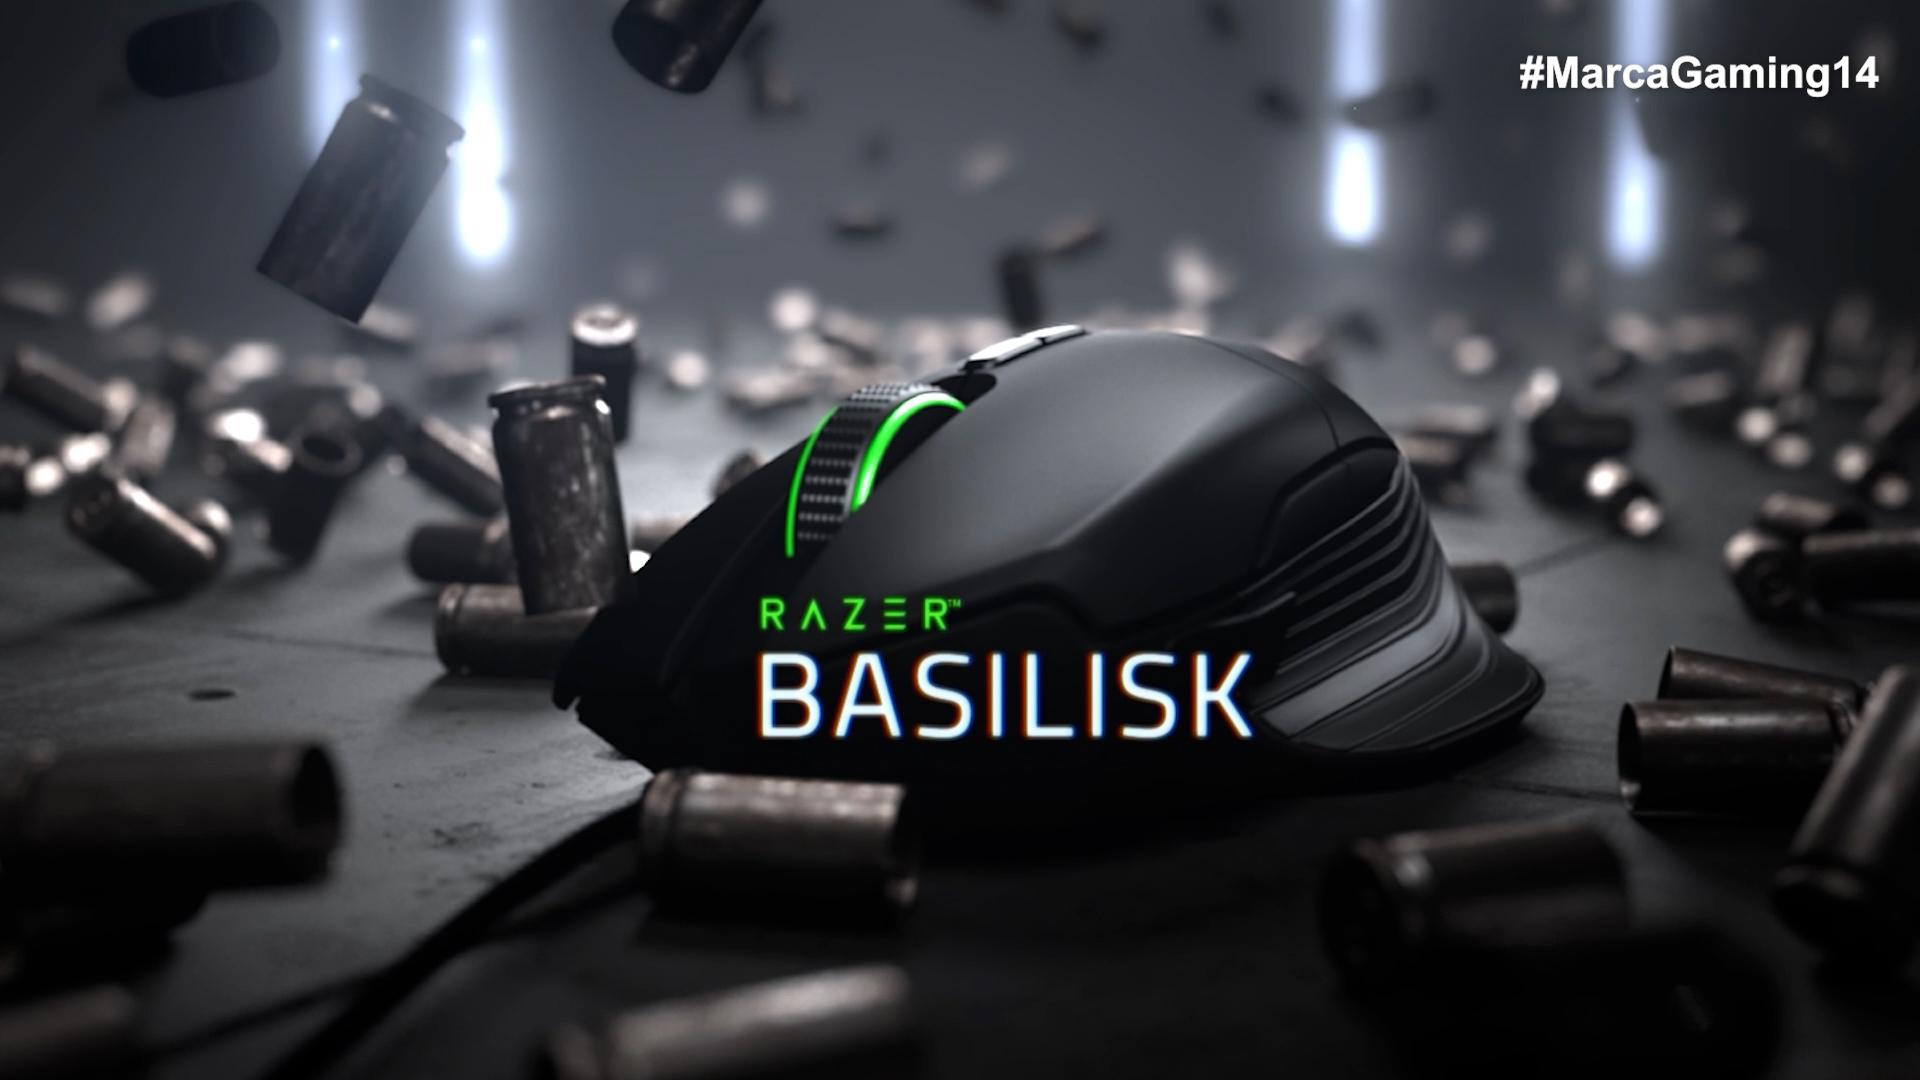 Ratón Razer Basilisk